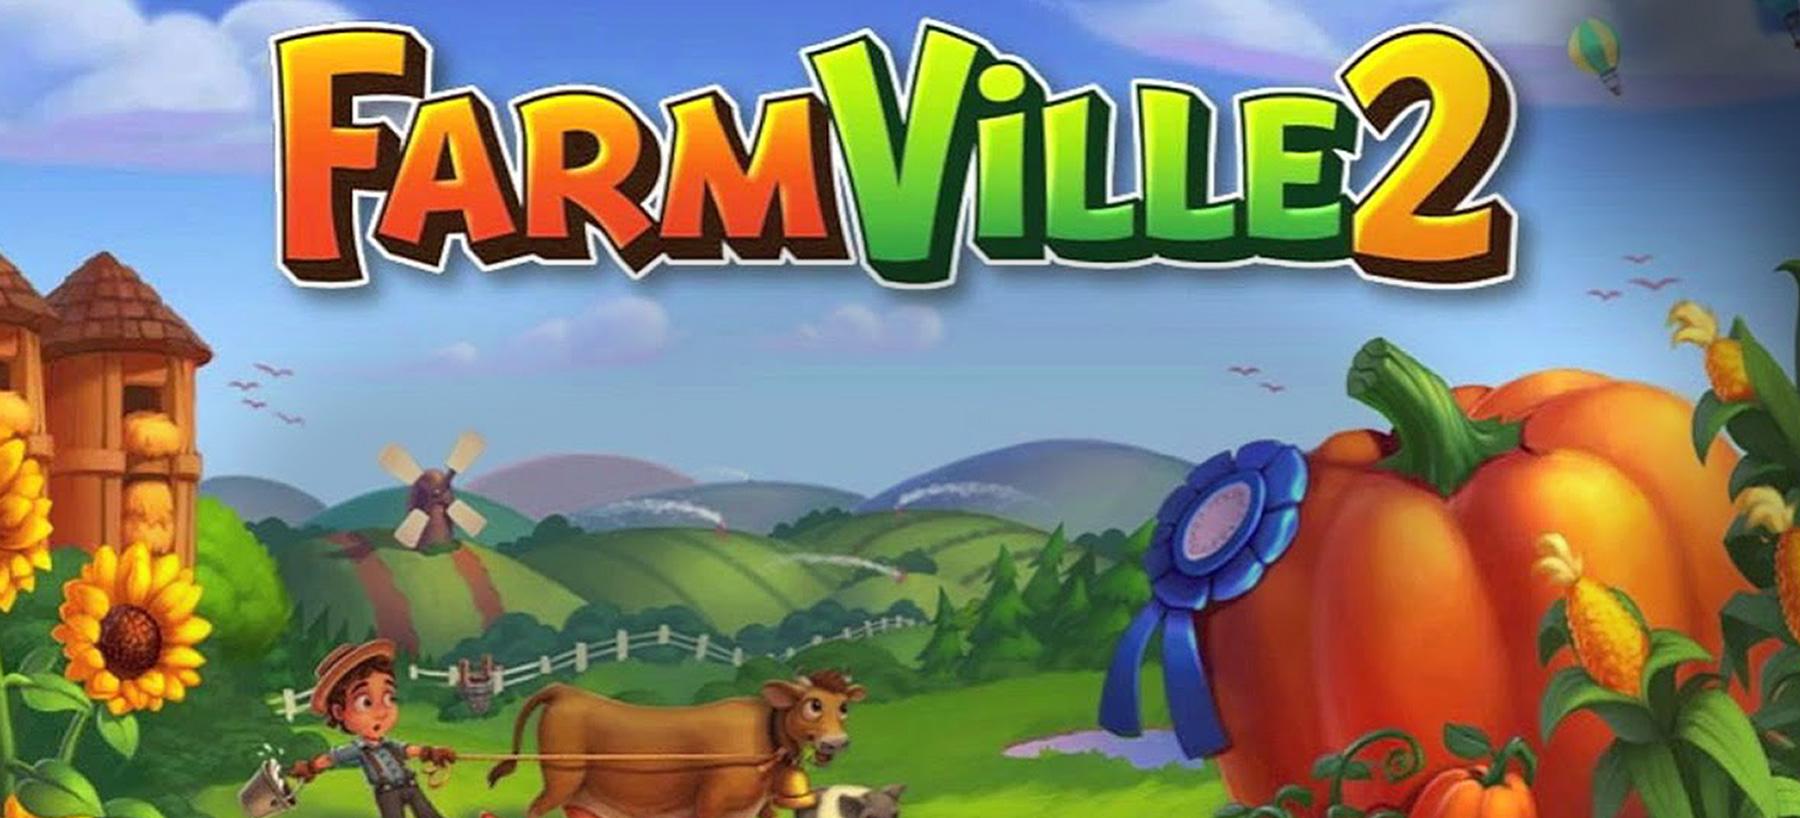 FarmVille 2 Hero Image